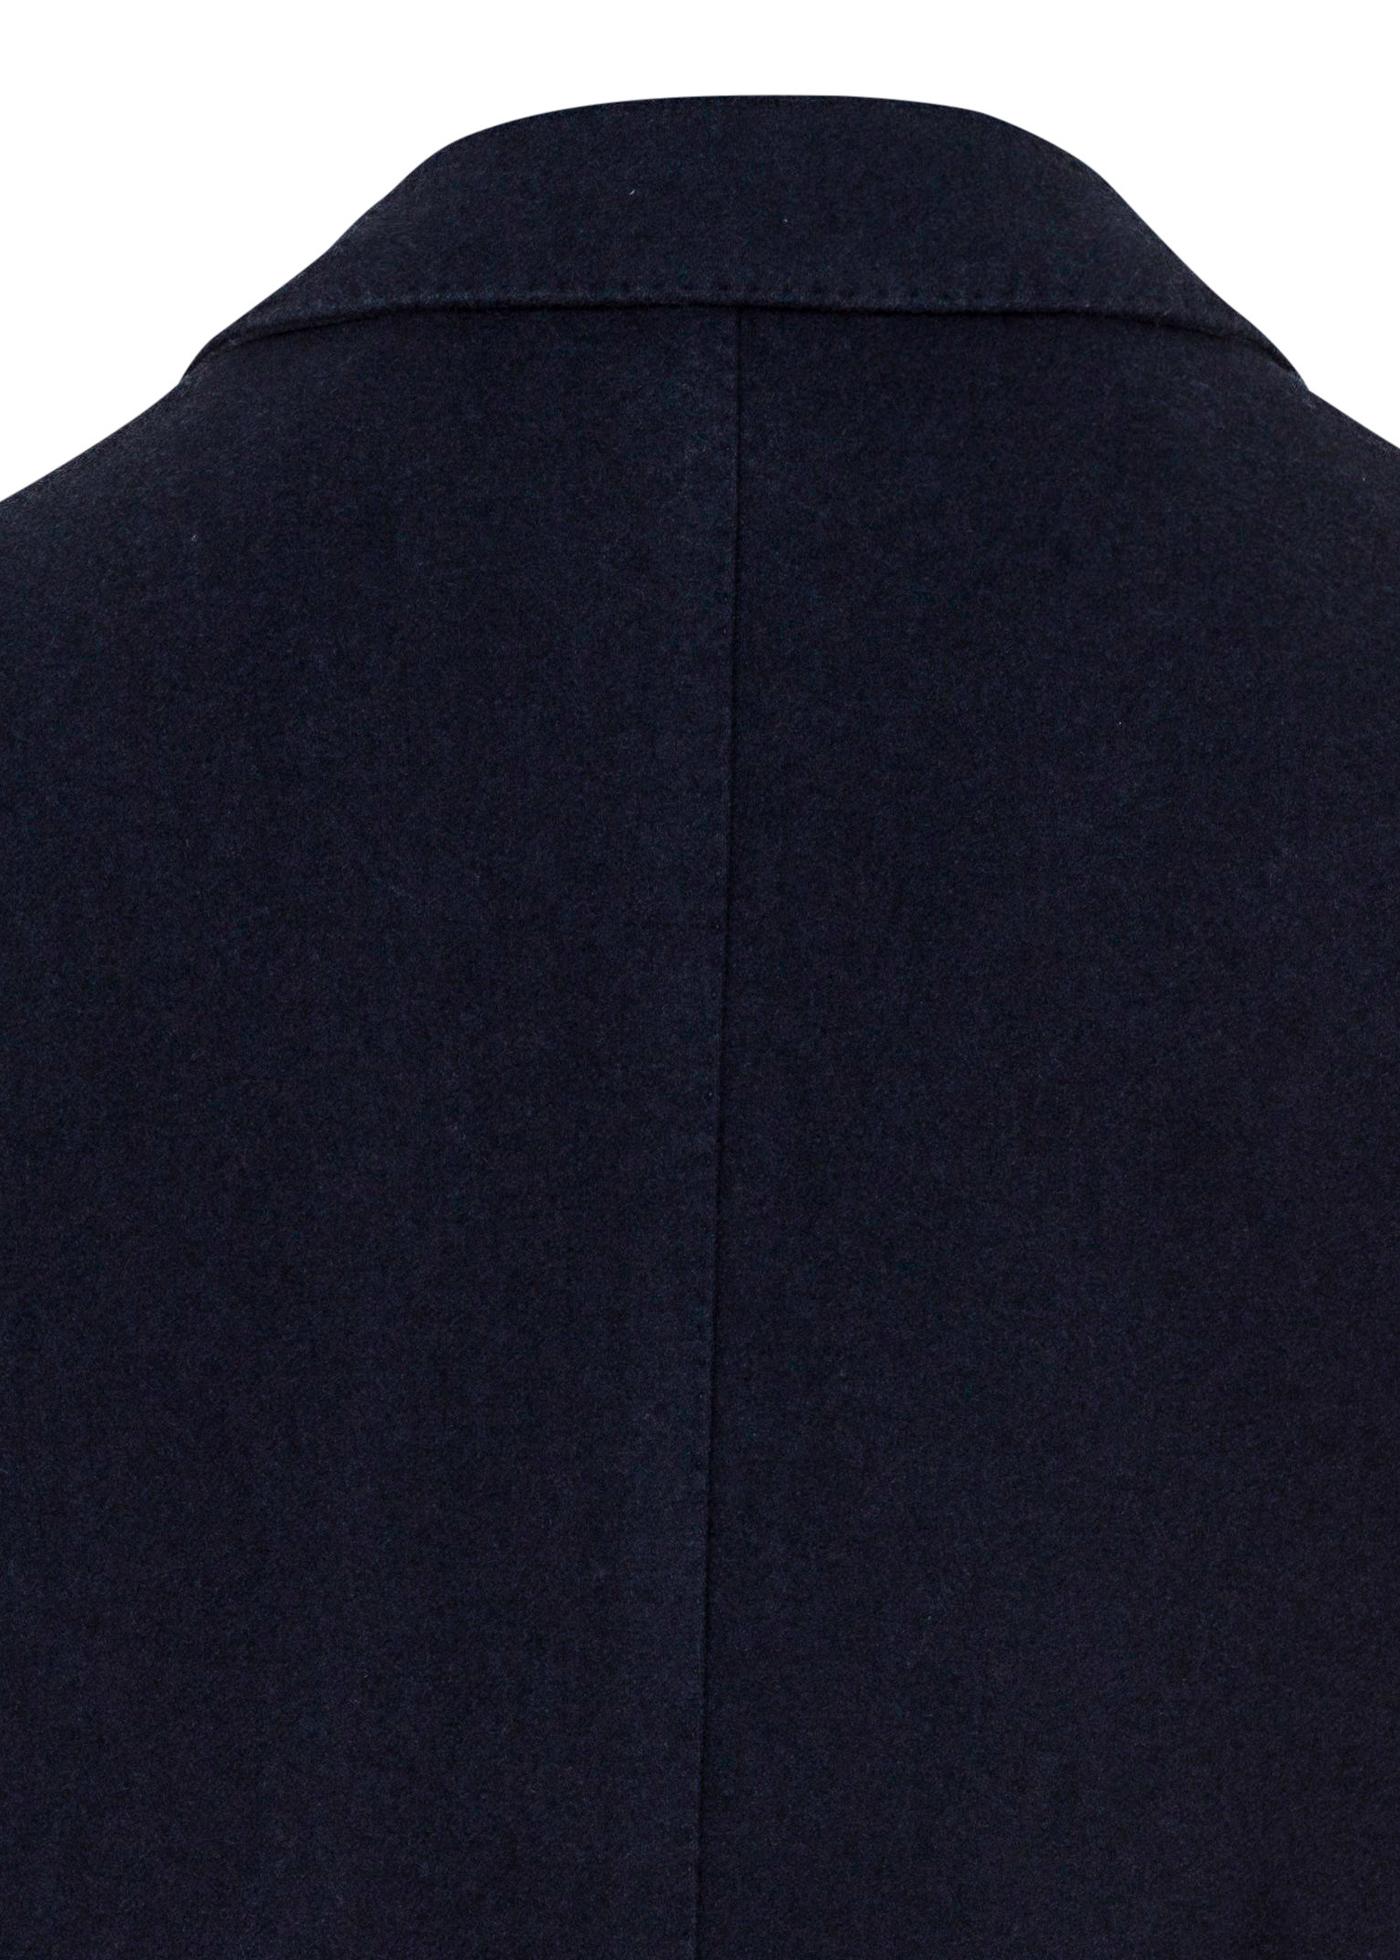 Washed Wool Coat SB image number 3